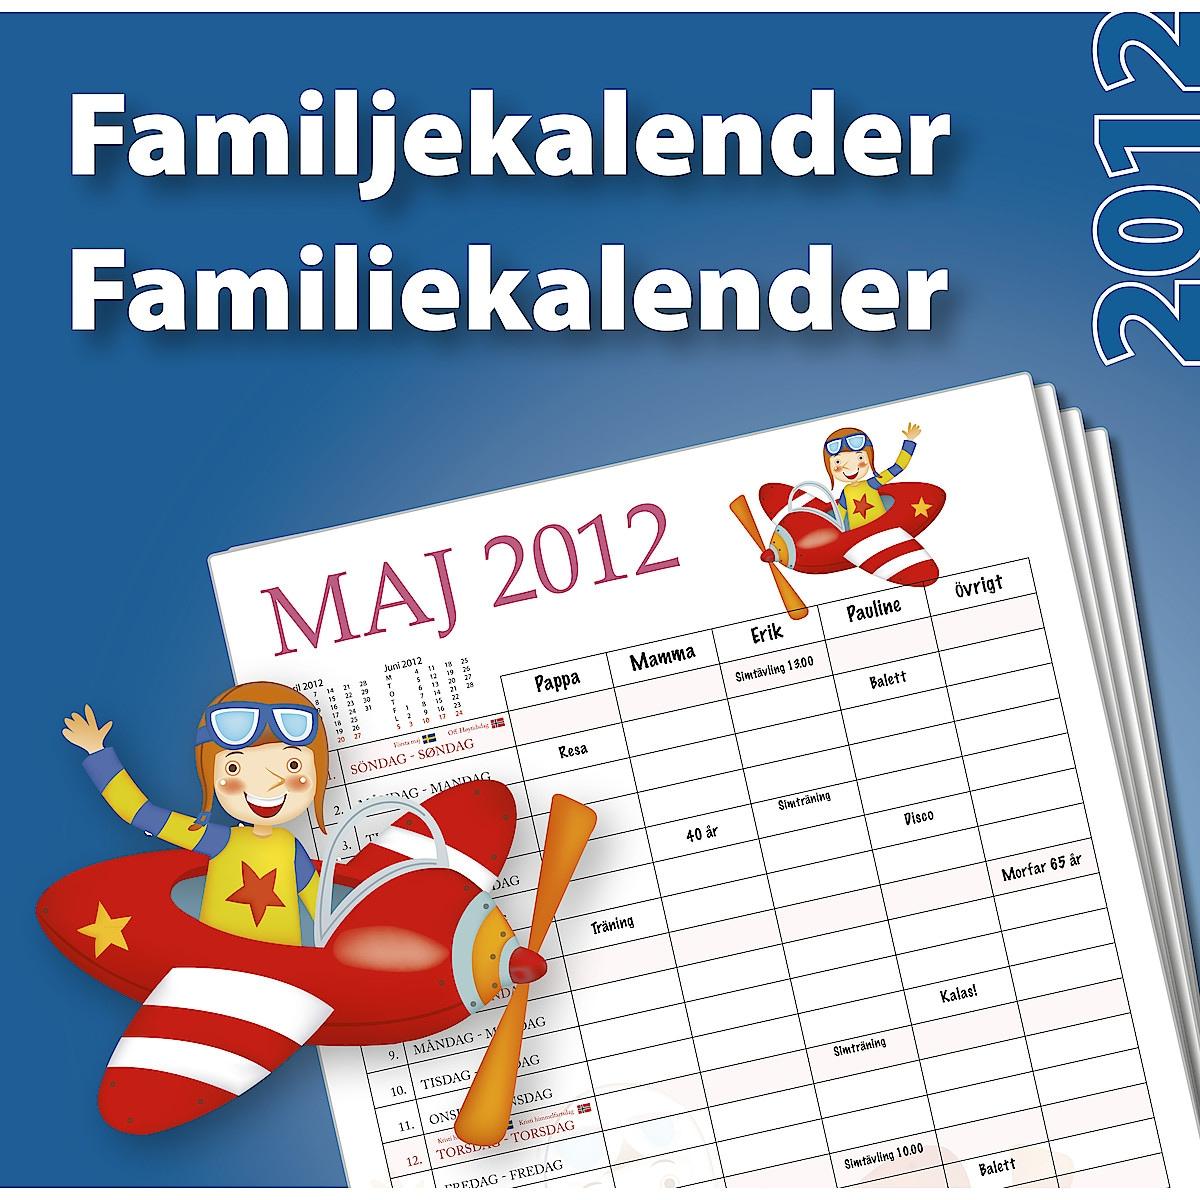 Familjekalender 2012